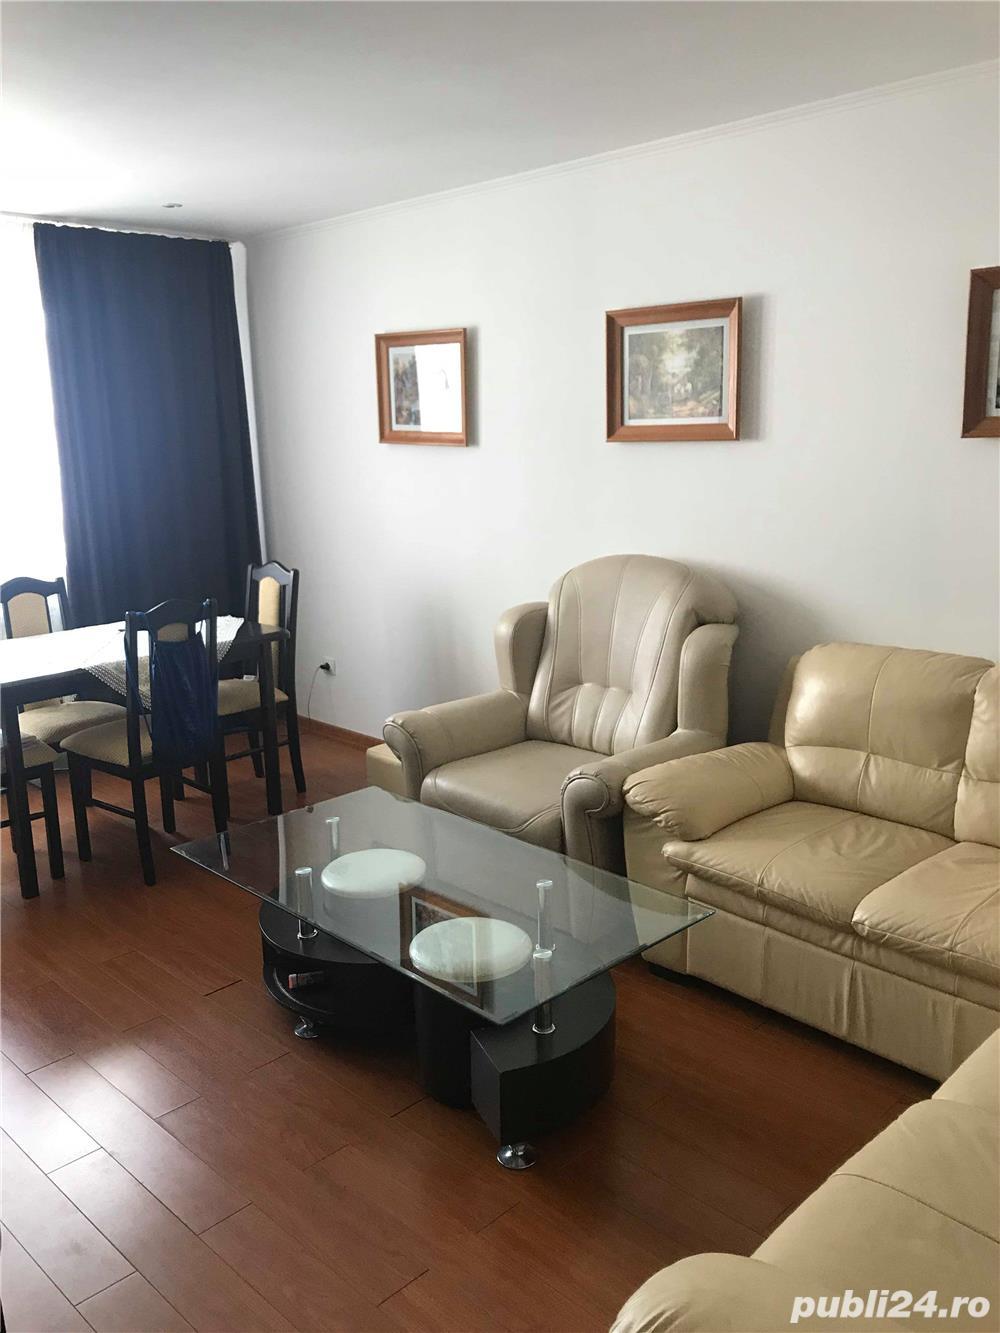 Apartament 3 cam decomadat, etaj 3, Zona Cartier - LUX